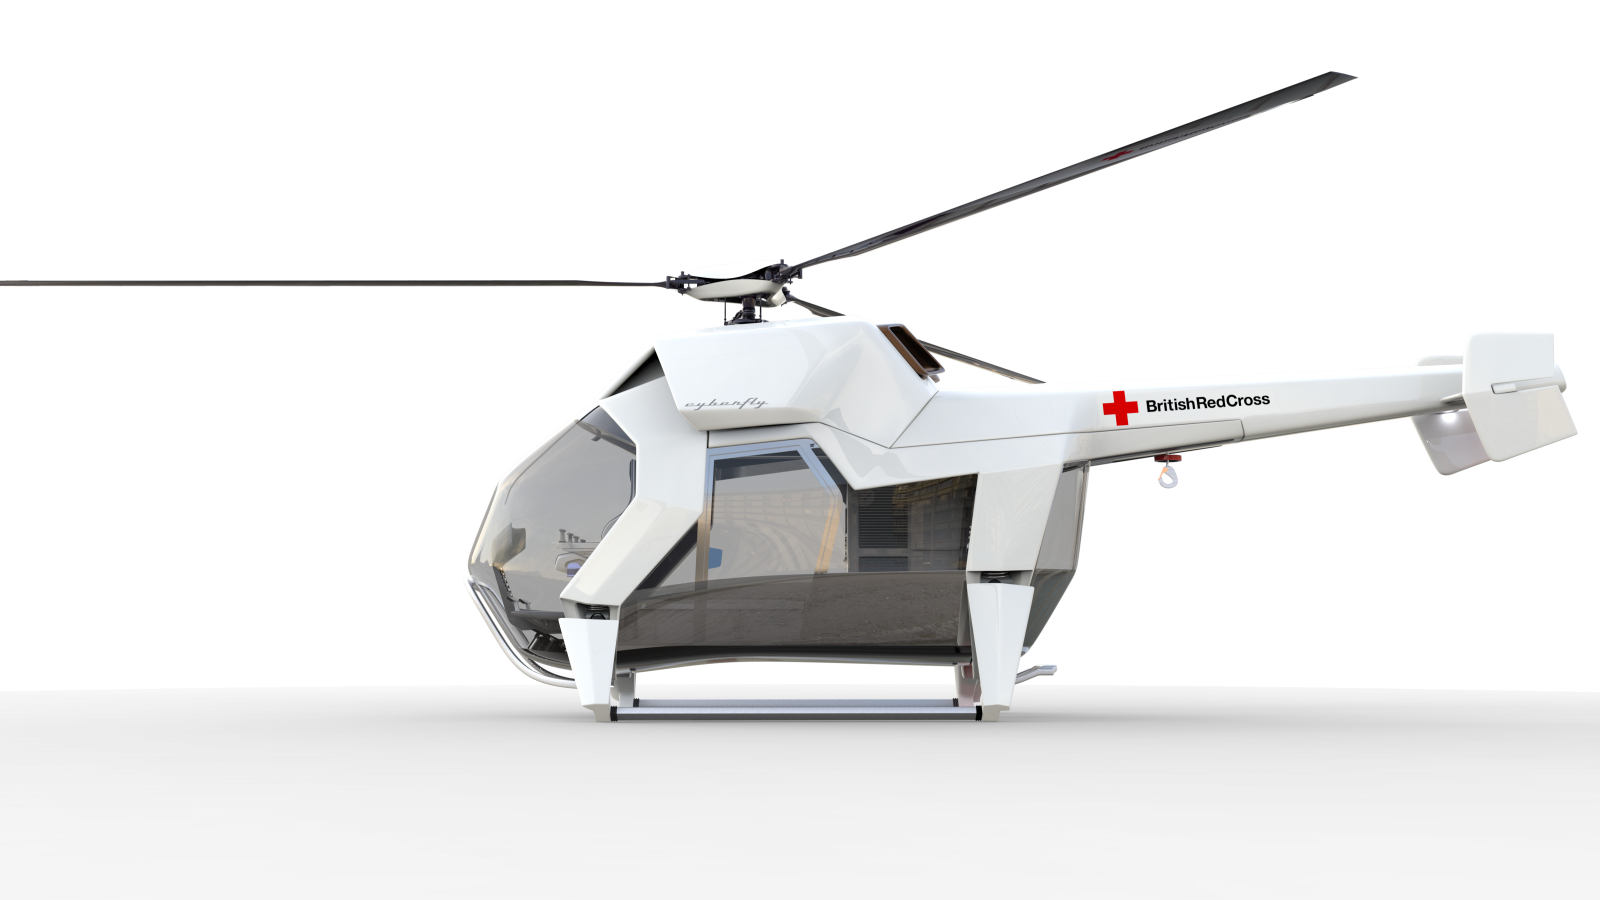 future helicoter design